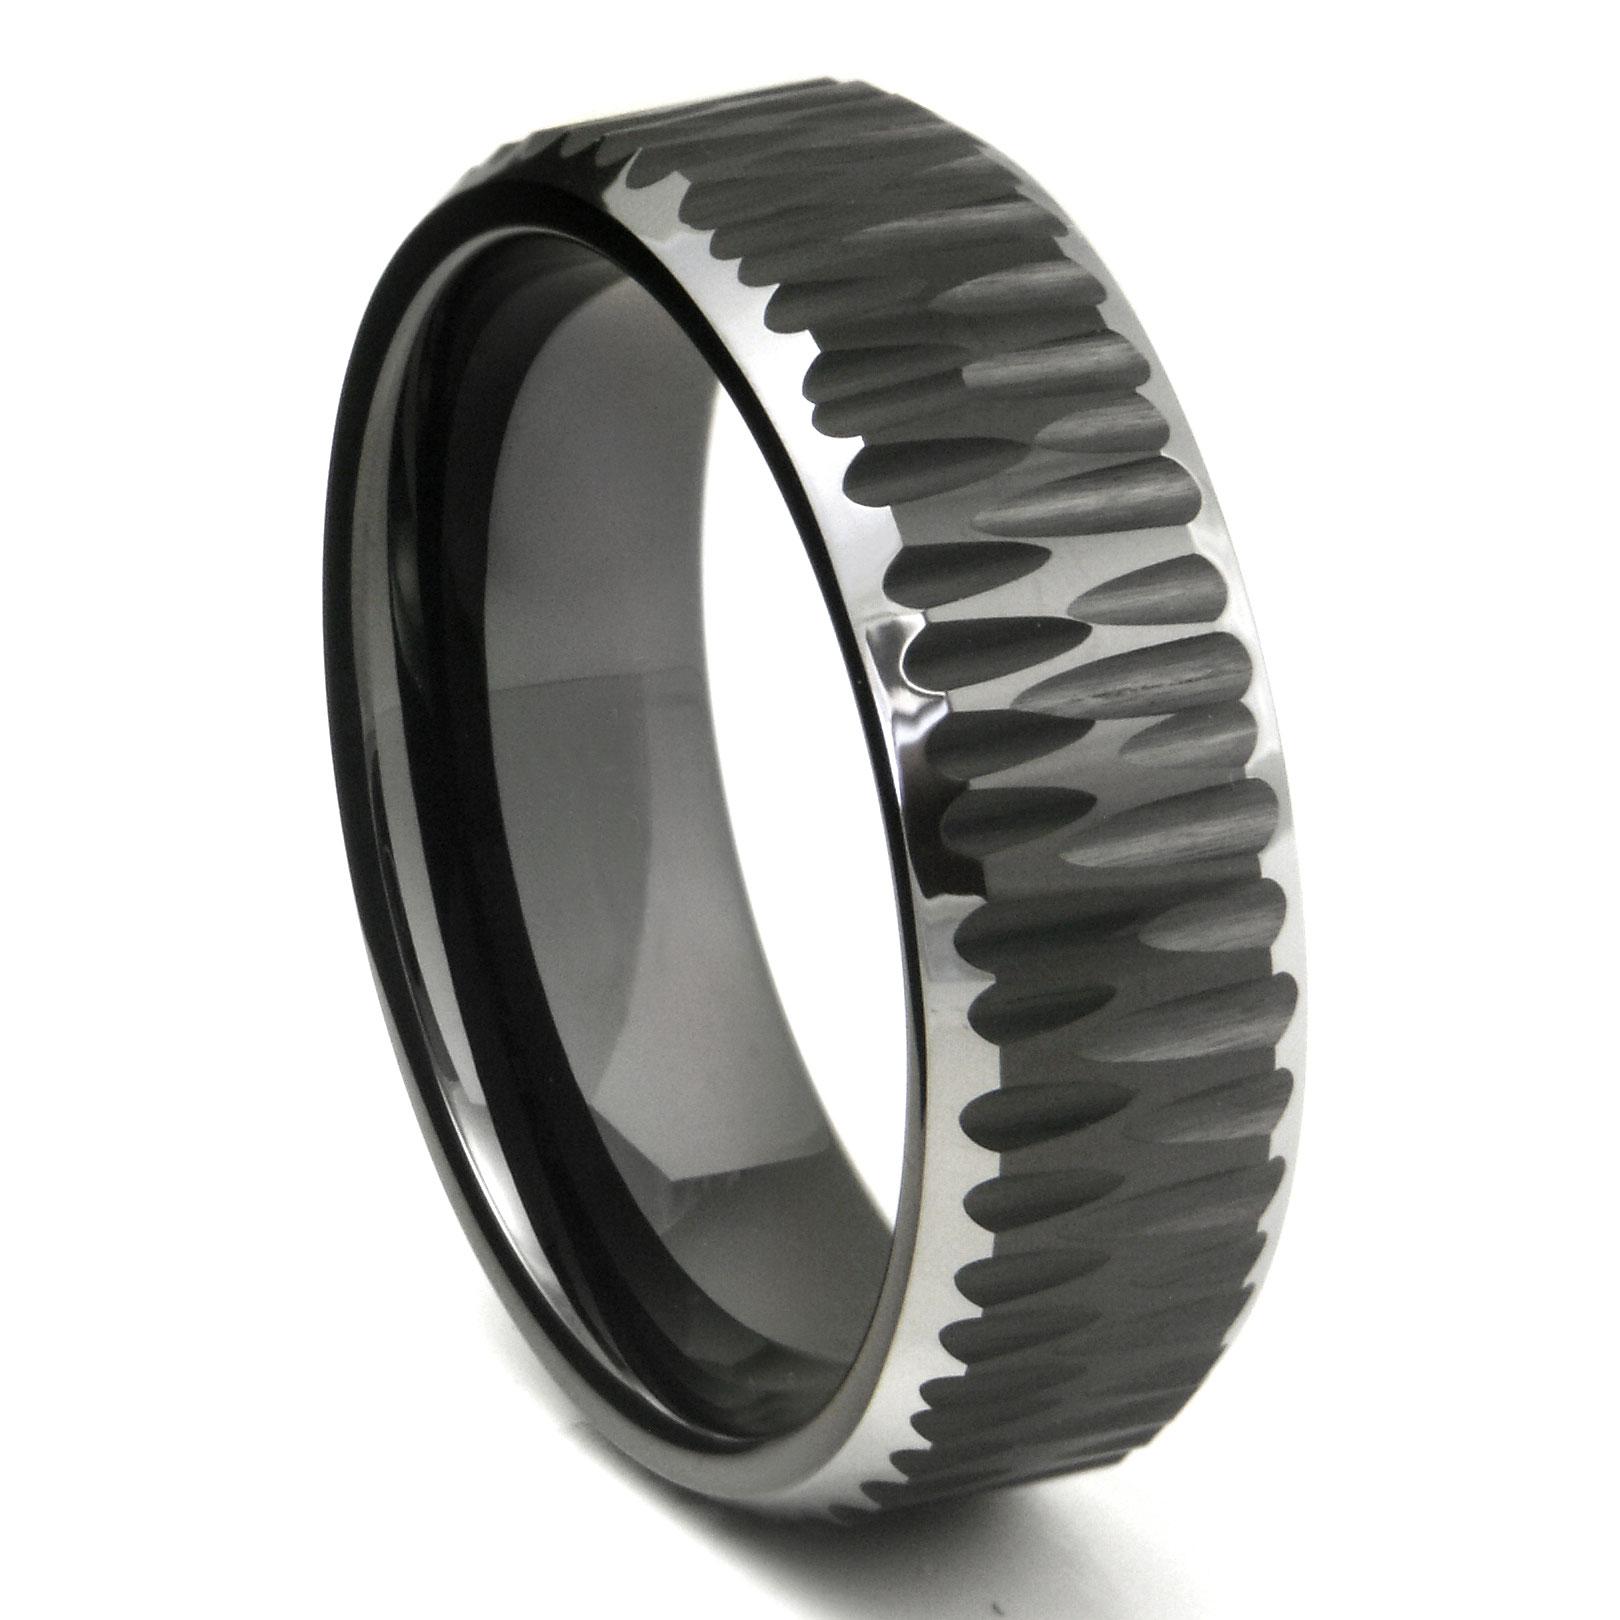 Black Tungsten Carbide Hammer Finish Beveled Wedding Band Ring P black wedding ring Loading zoom